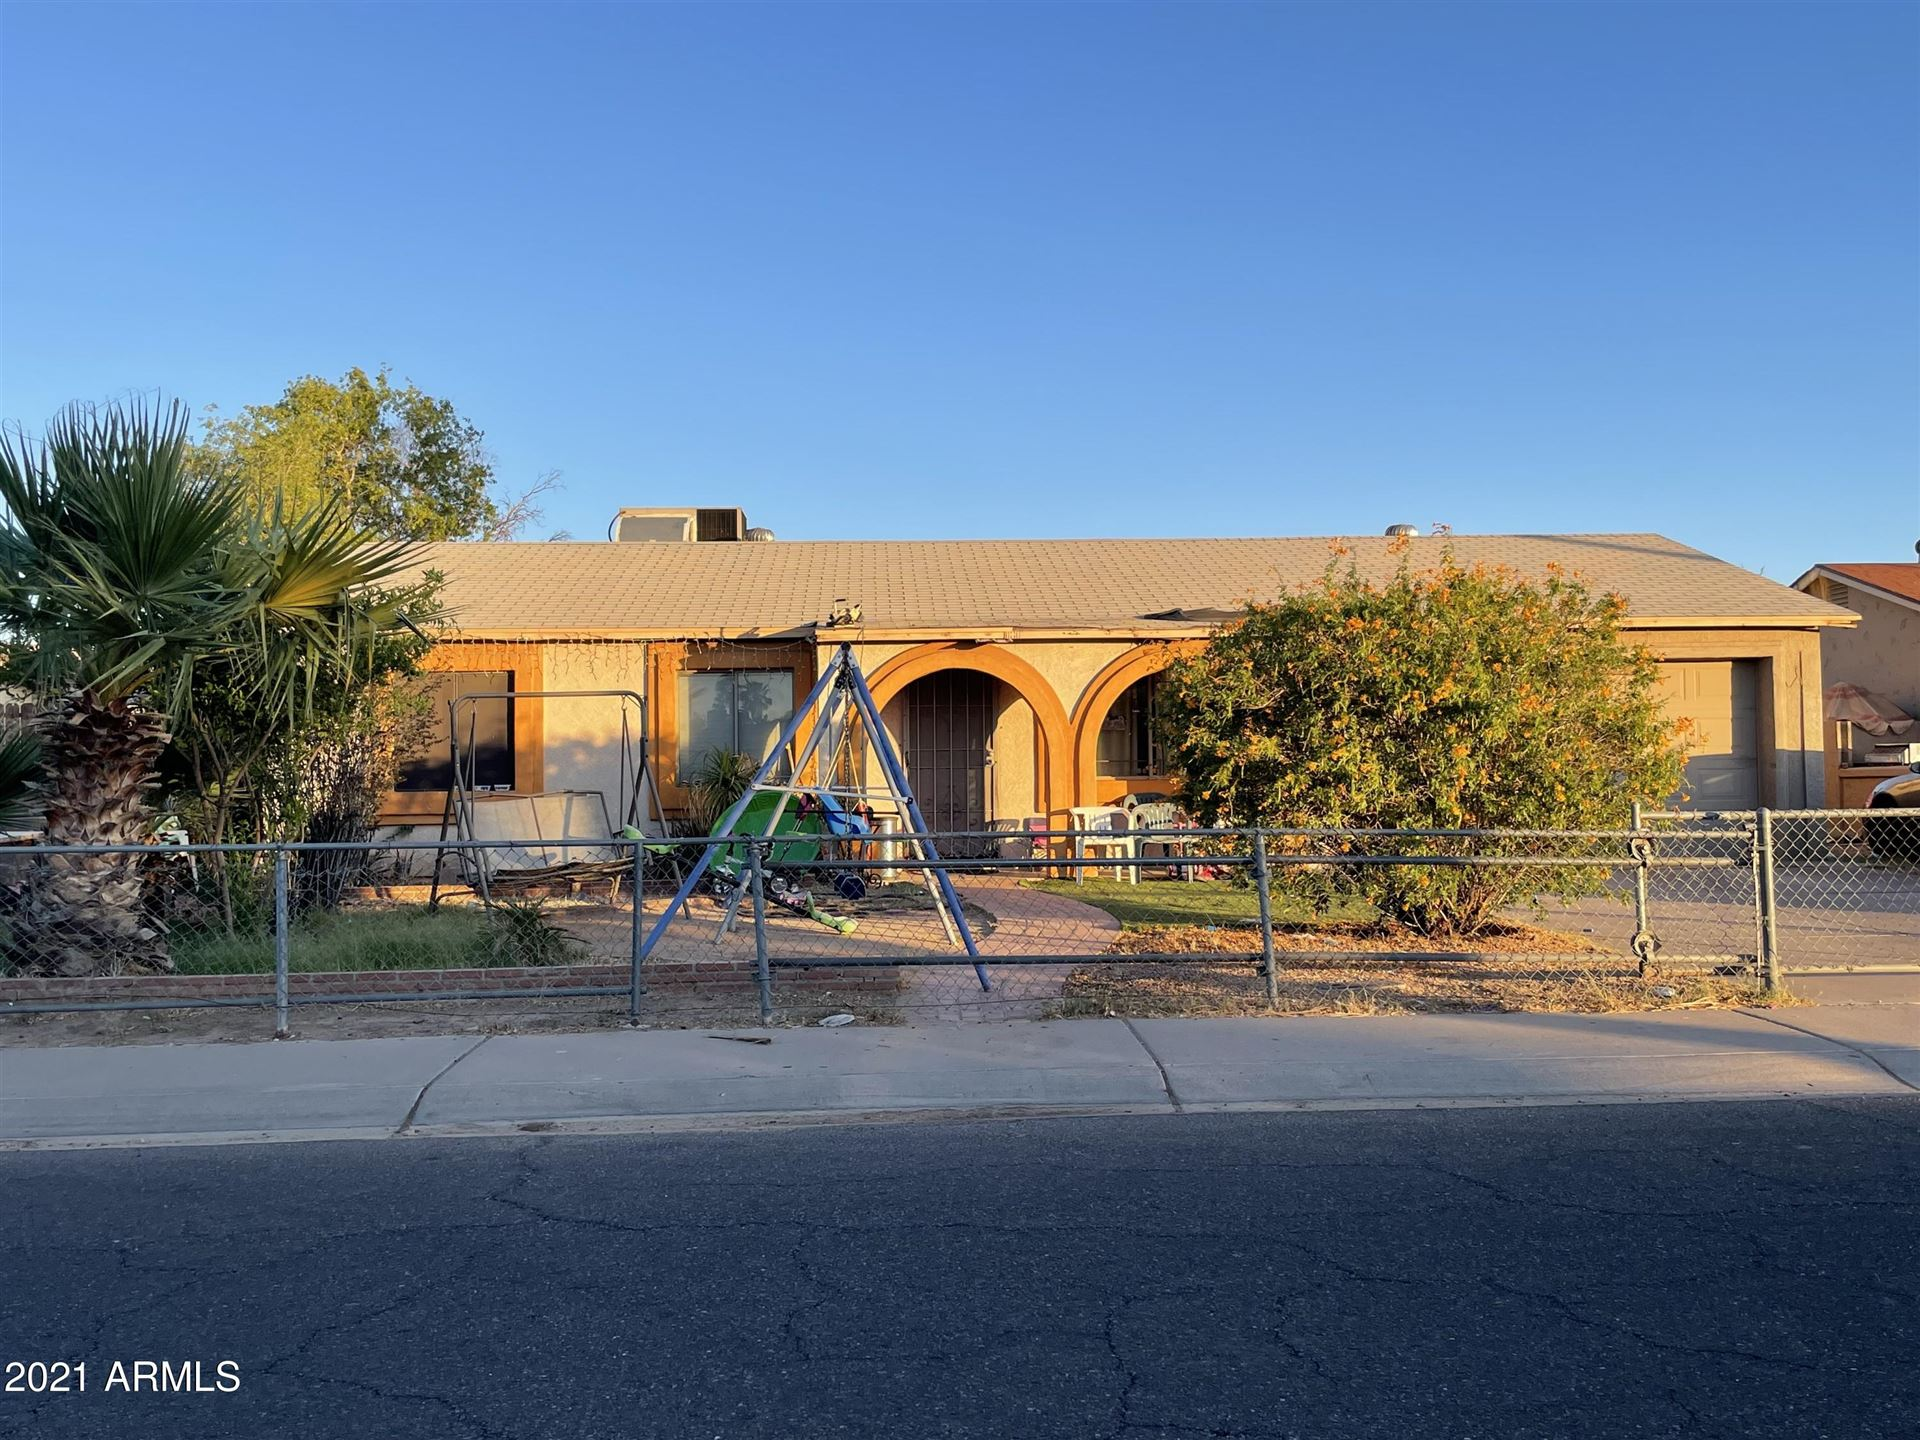 6723 W CORONADO Road, Phoenix, AZ 85035 - MLS#: 6250572